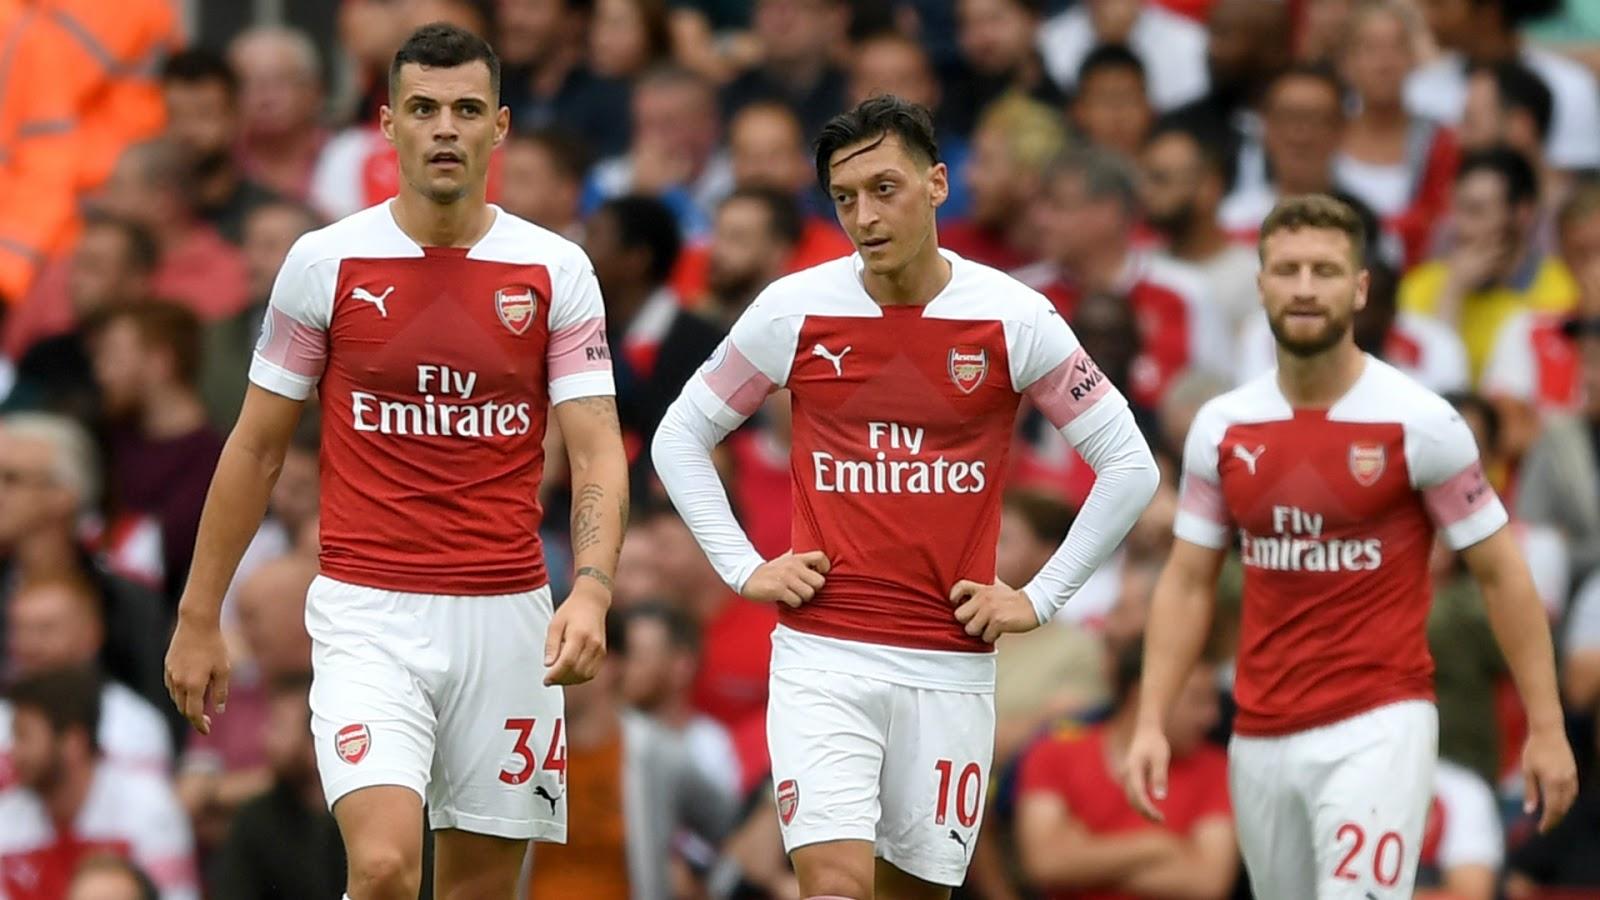 #Englishpremierleague Season 2018/2019 Full Time Arsenal 0